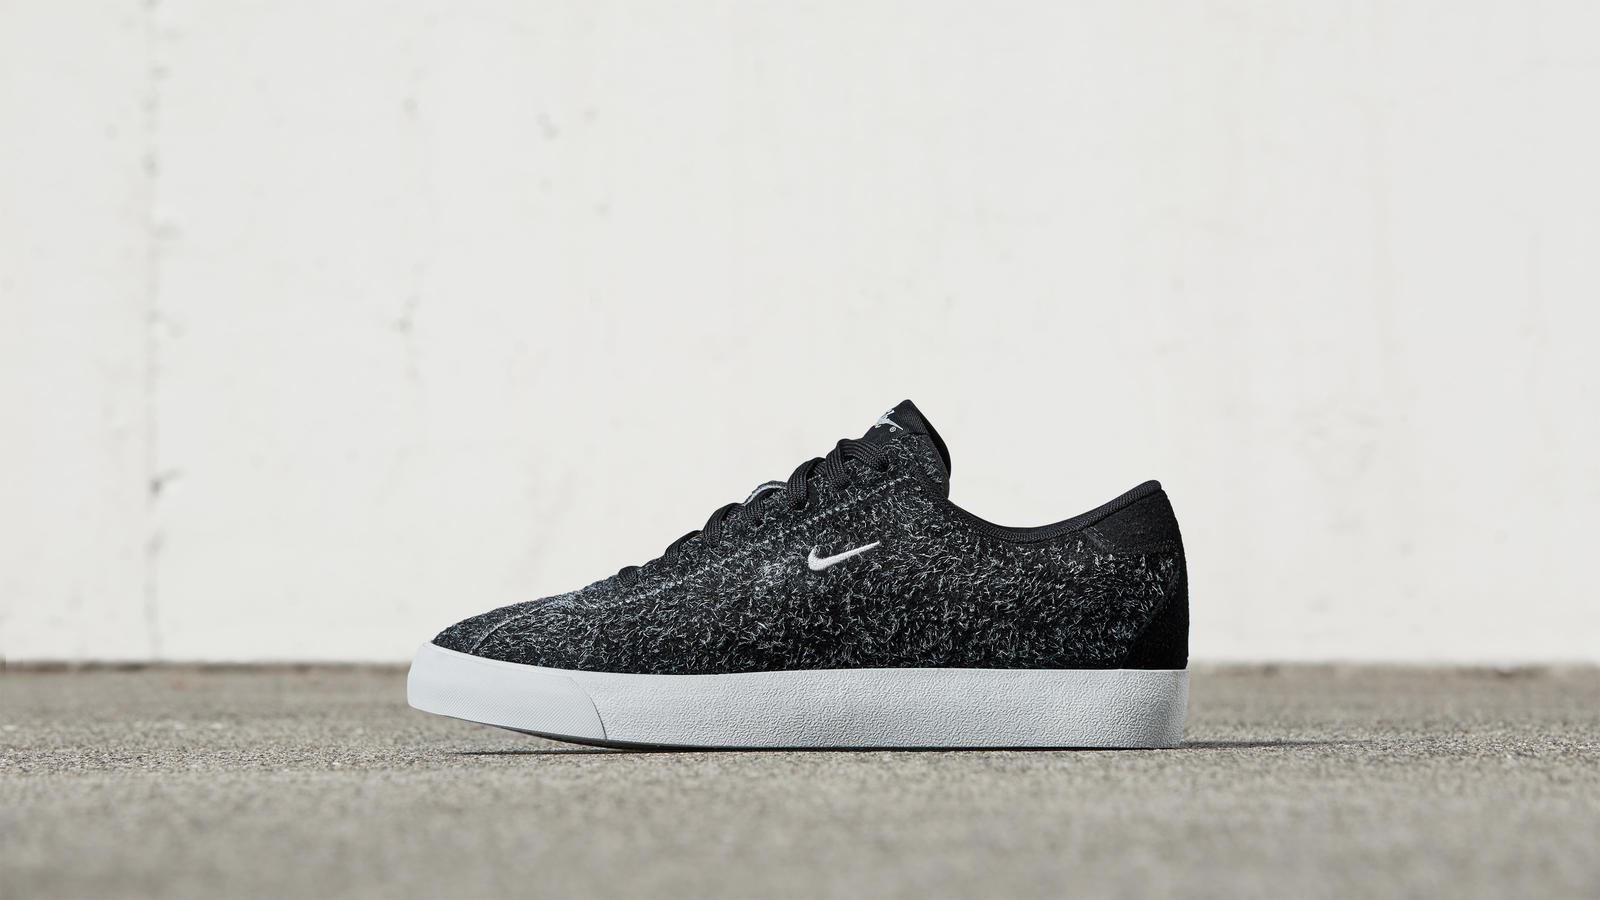 Nike Match Classic Suede - Nike News